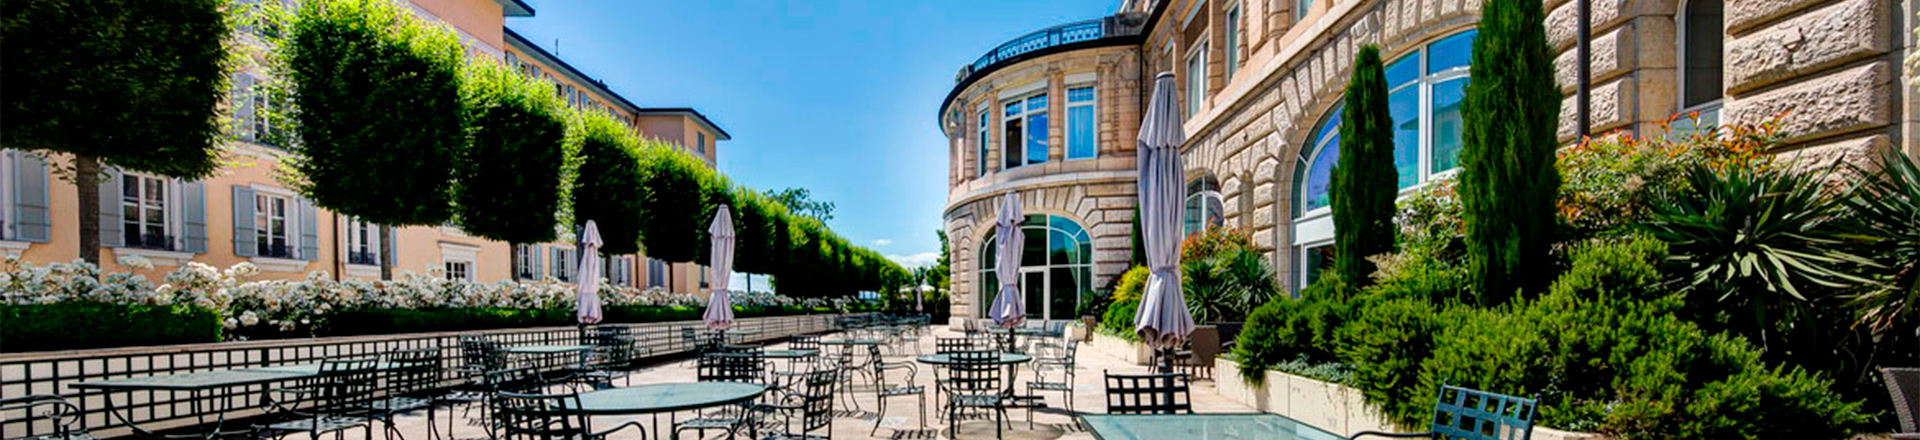 Lausanne Palace WNG Agence Digitale